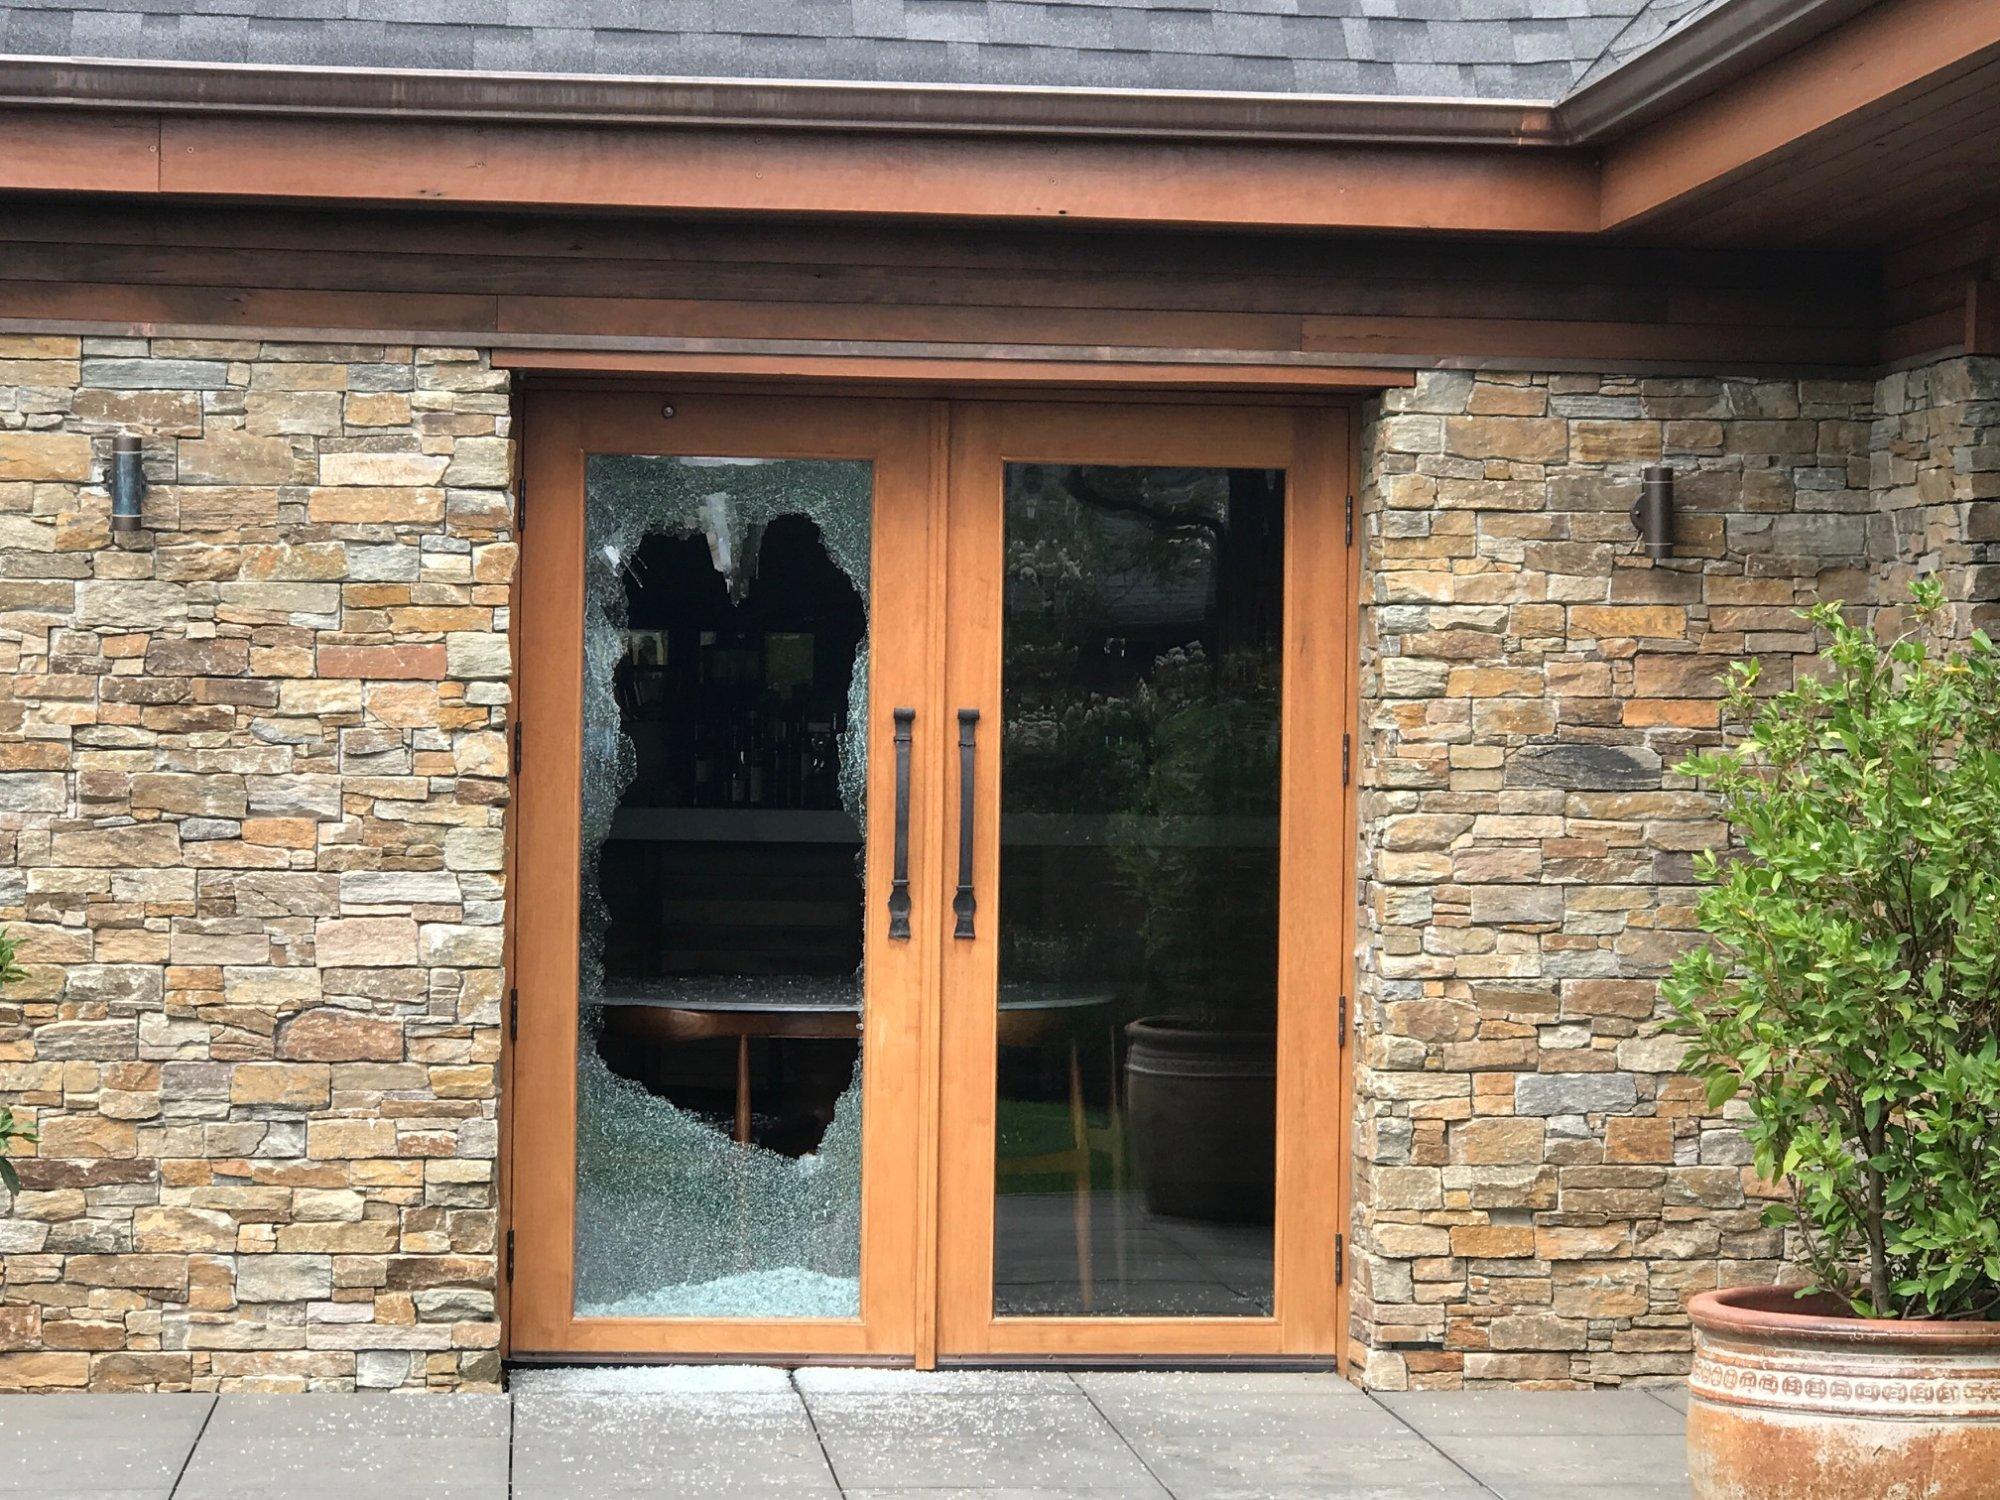 Pialligo Estate Farmhouse with one glass door panel destroyed. Photo: Charlotte Harper